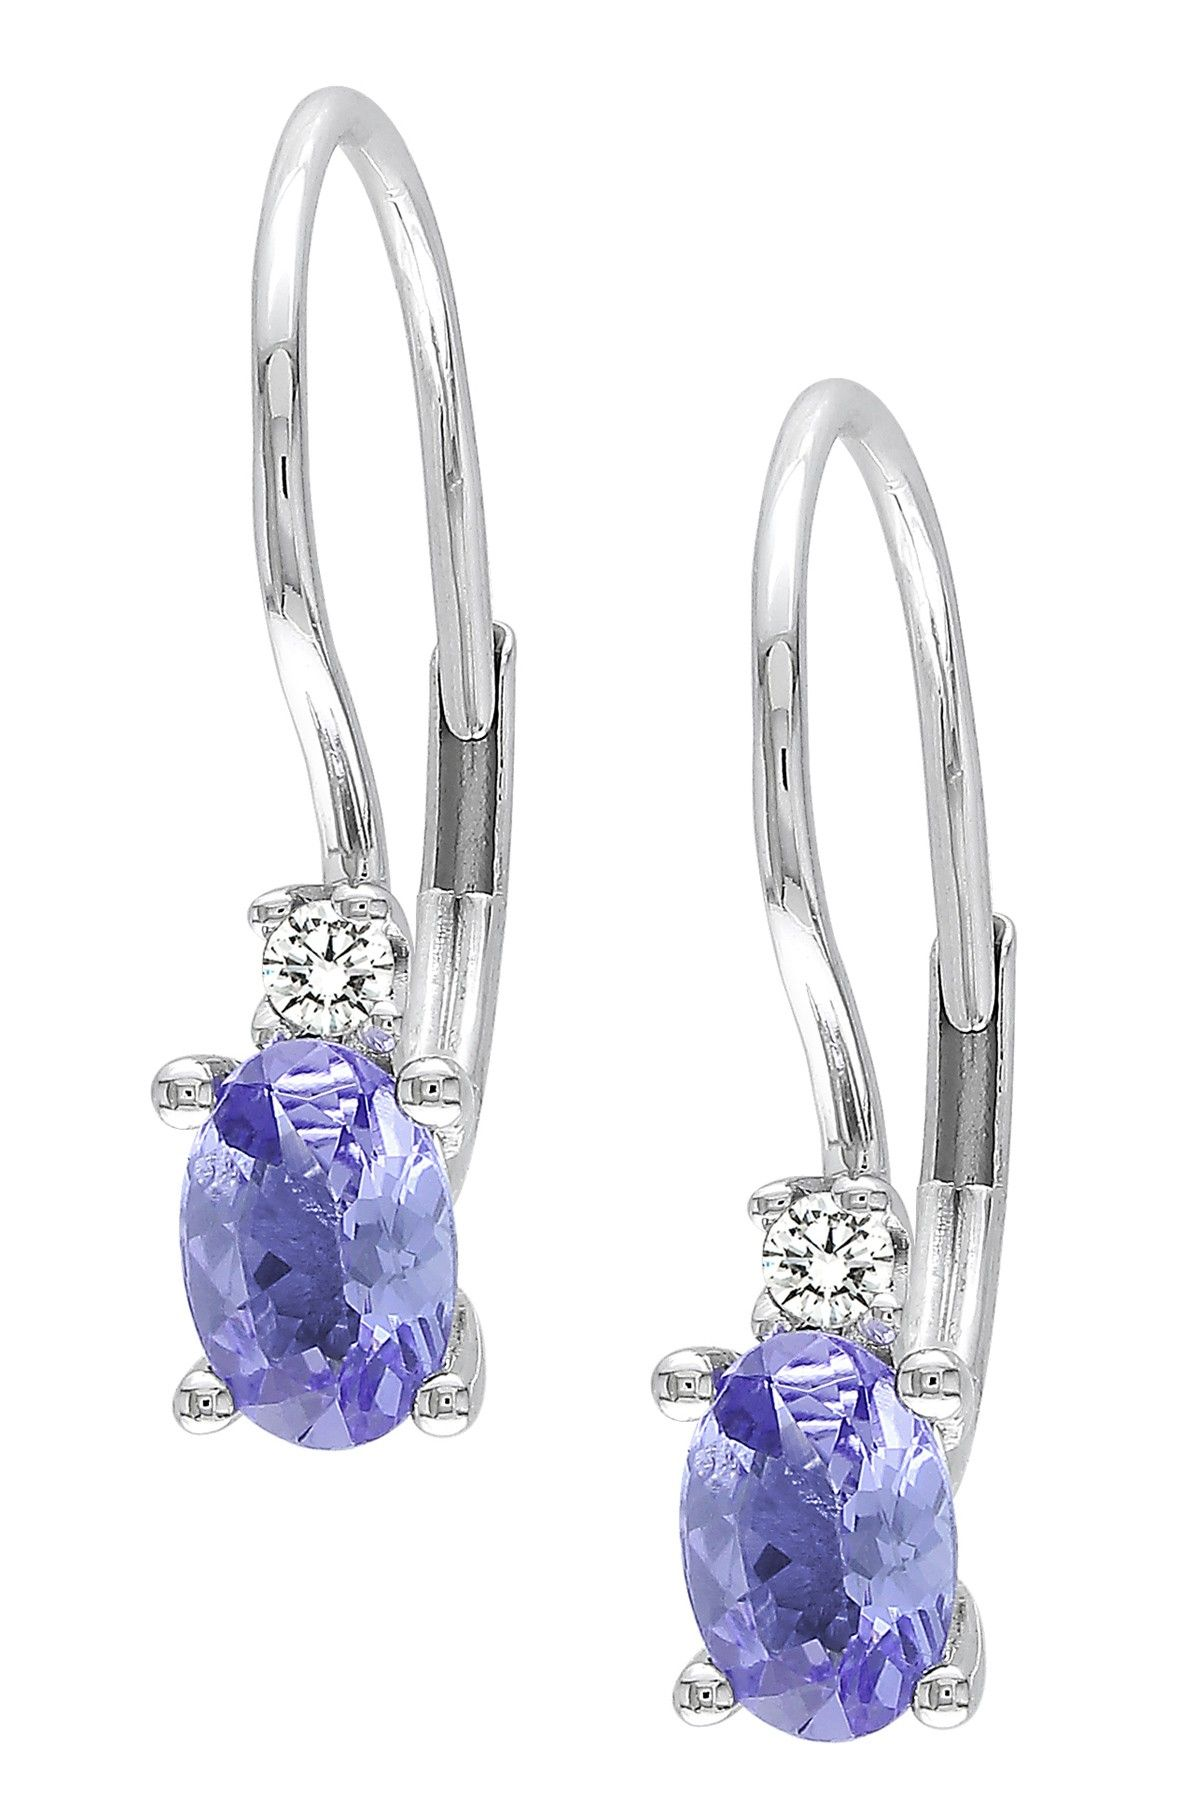 0K White Gold Diamond & Tanzanite Earrings - 0.06 ctw